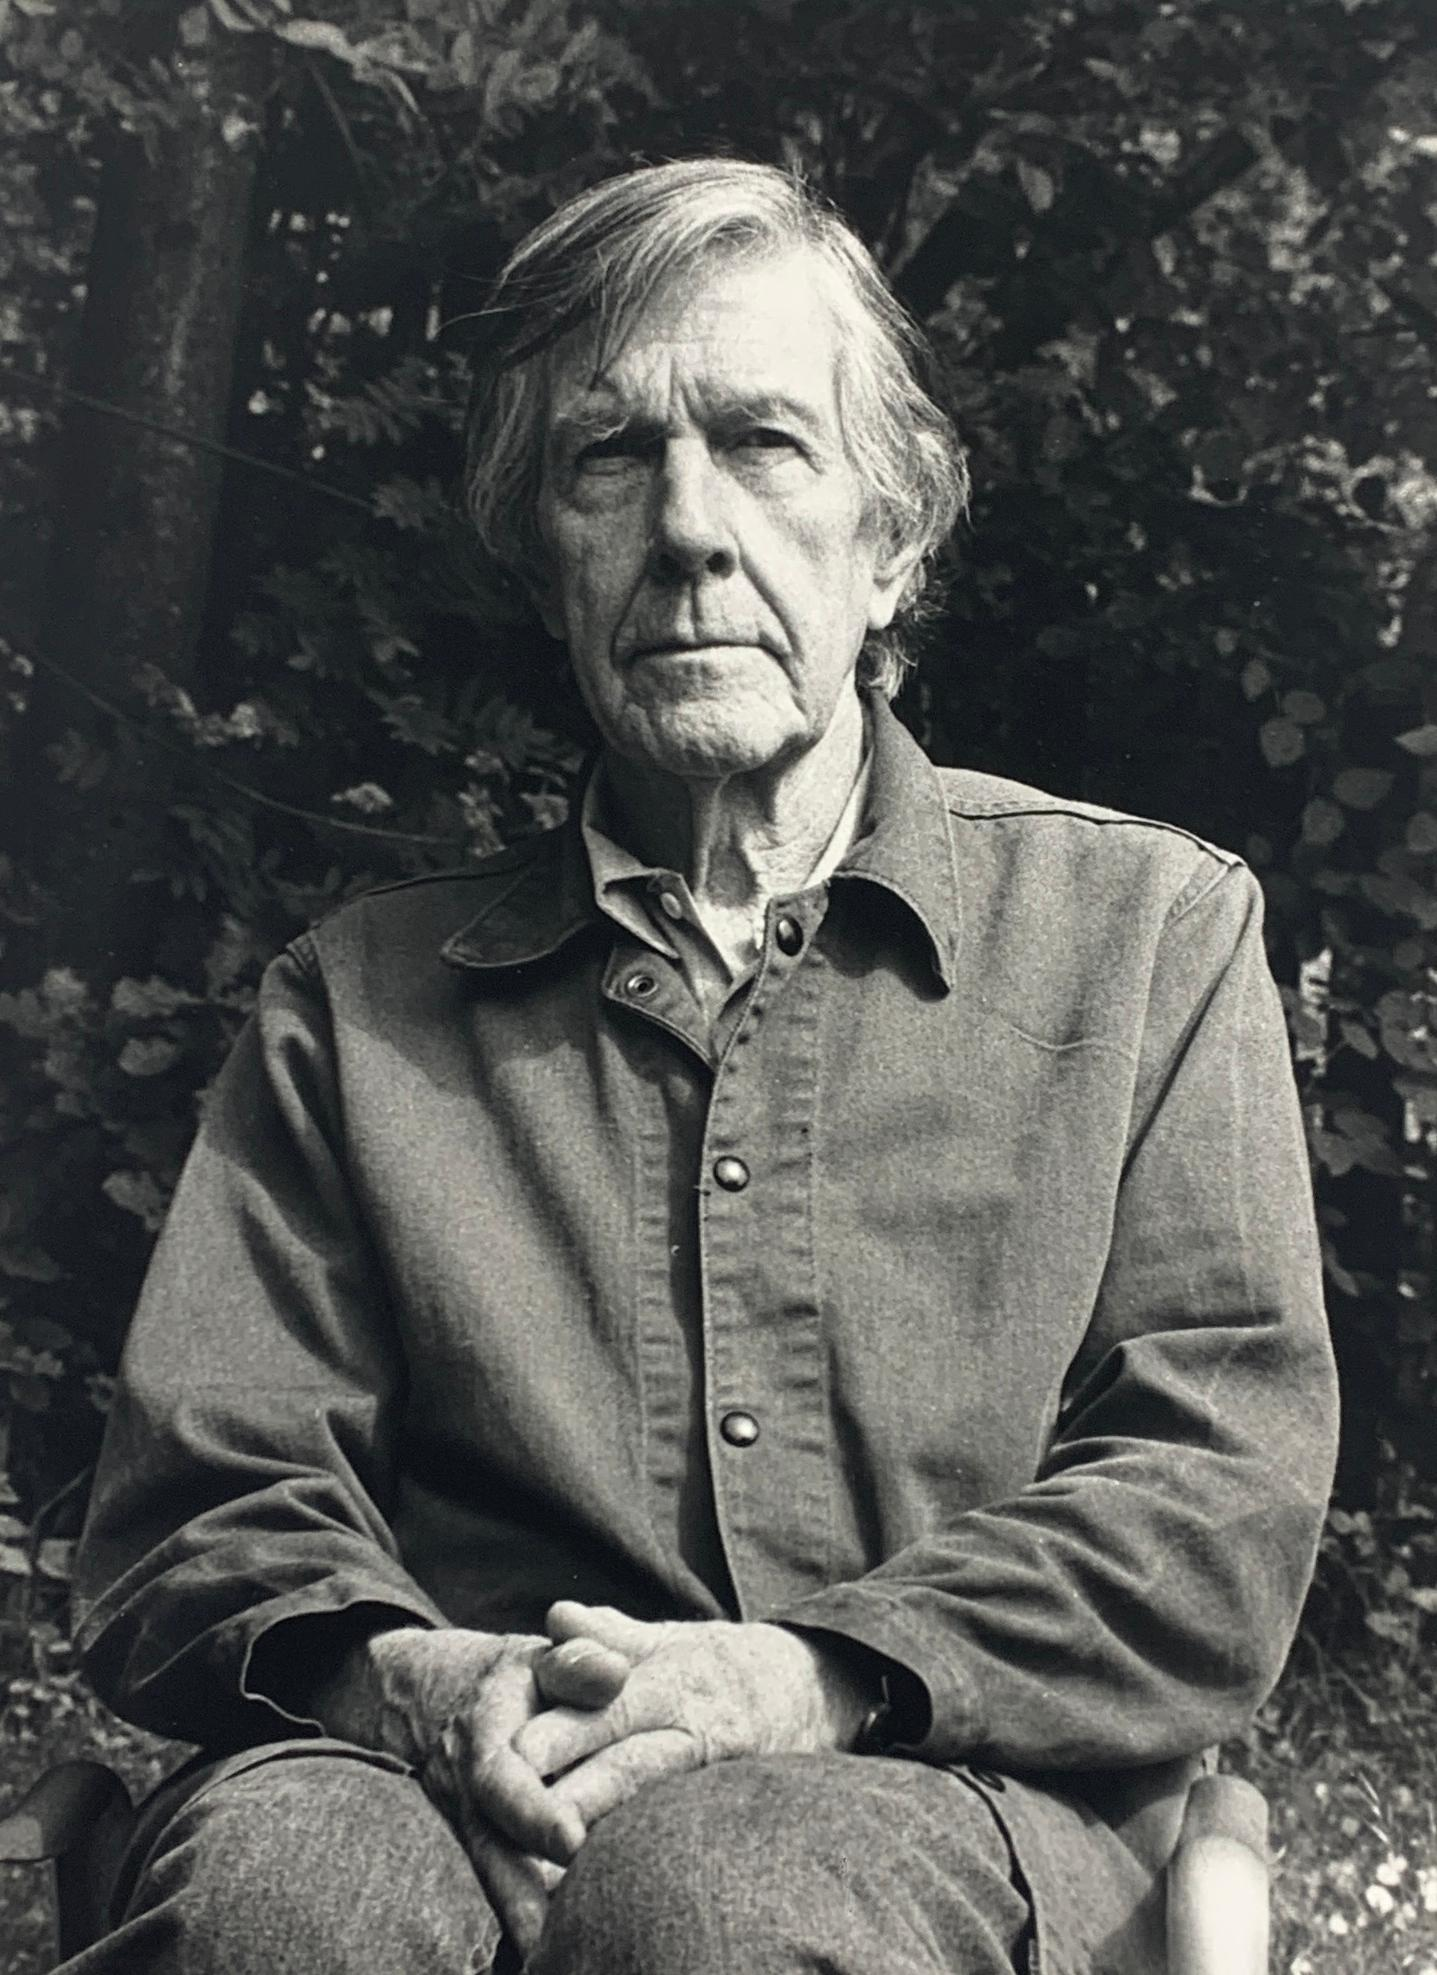 Portrait photo of John Cage by Rolf Hans, Wetzikon, Switzerland Mai, 1990 II